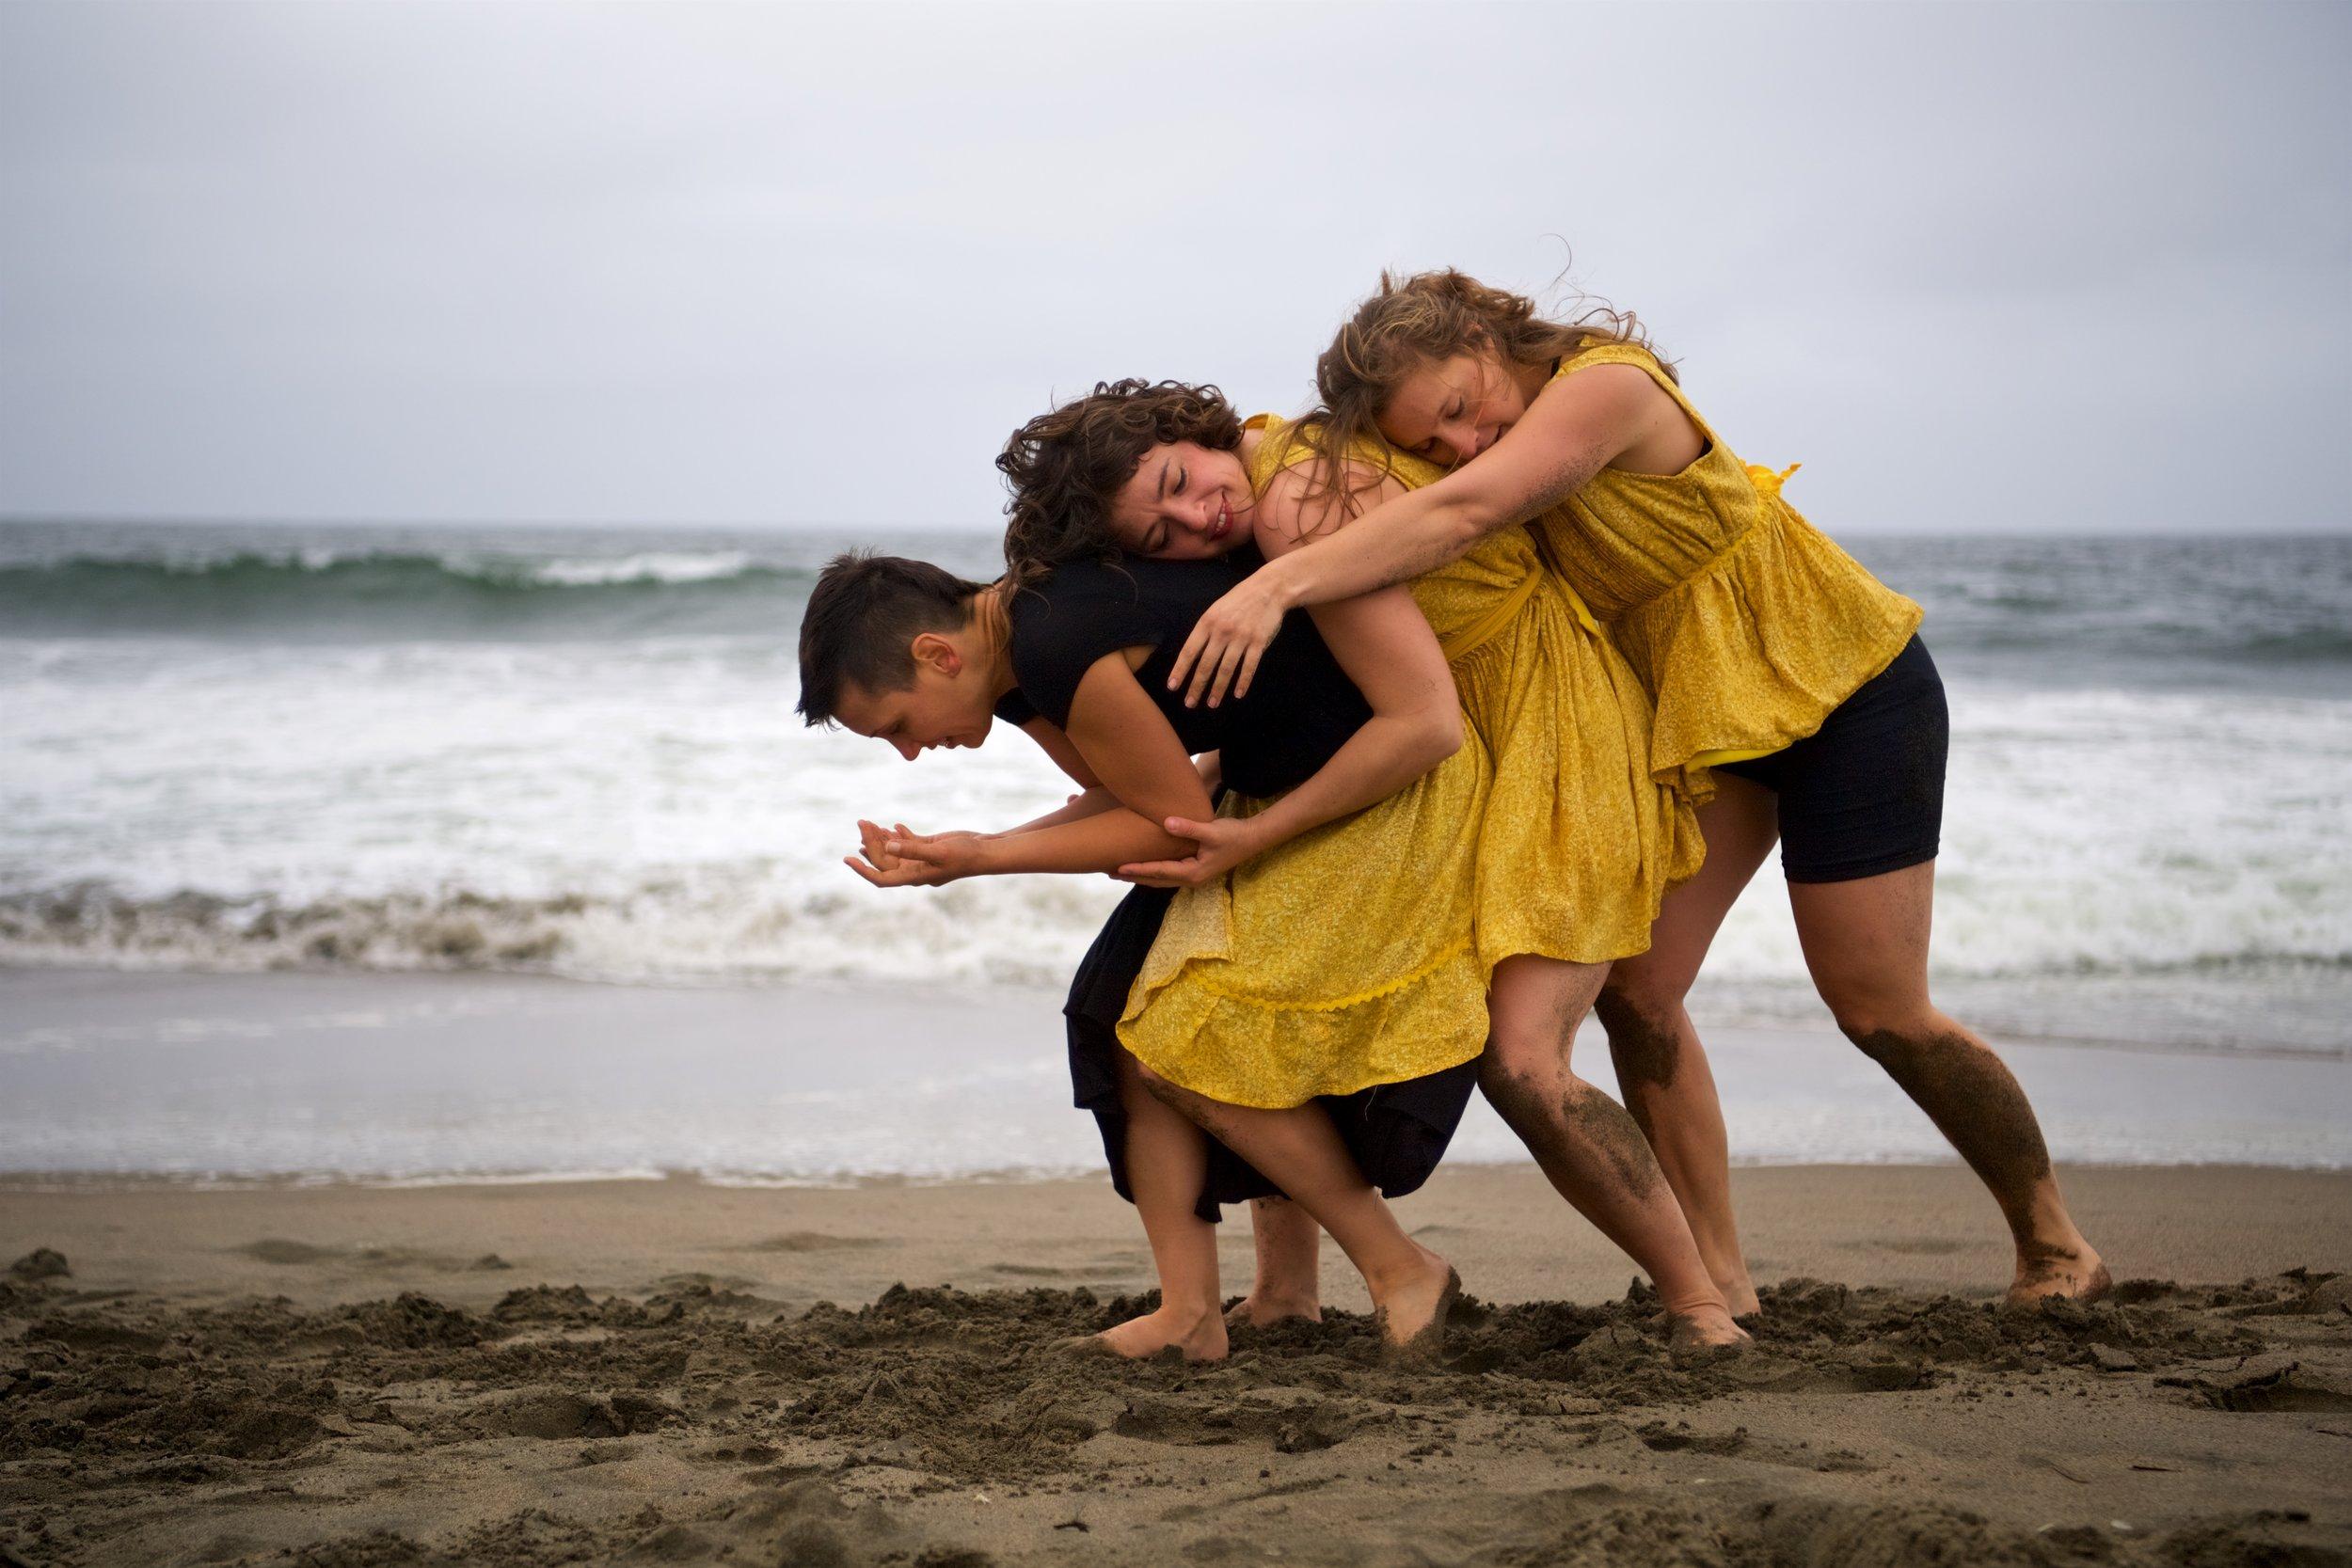 uplift-theatre-ocean-beach-2016-09-12-0785.jpg